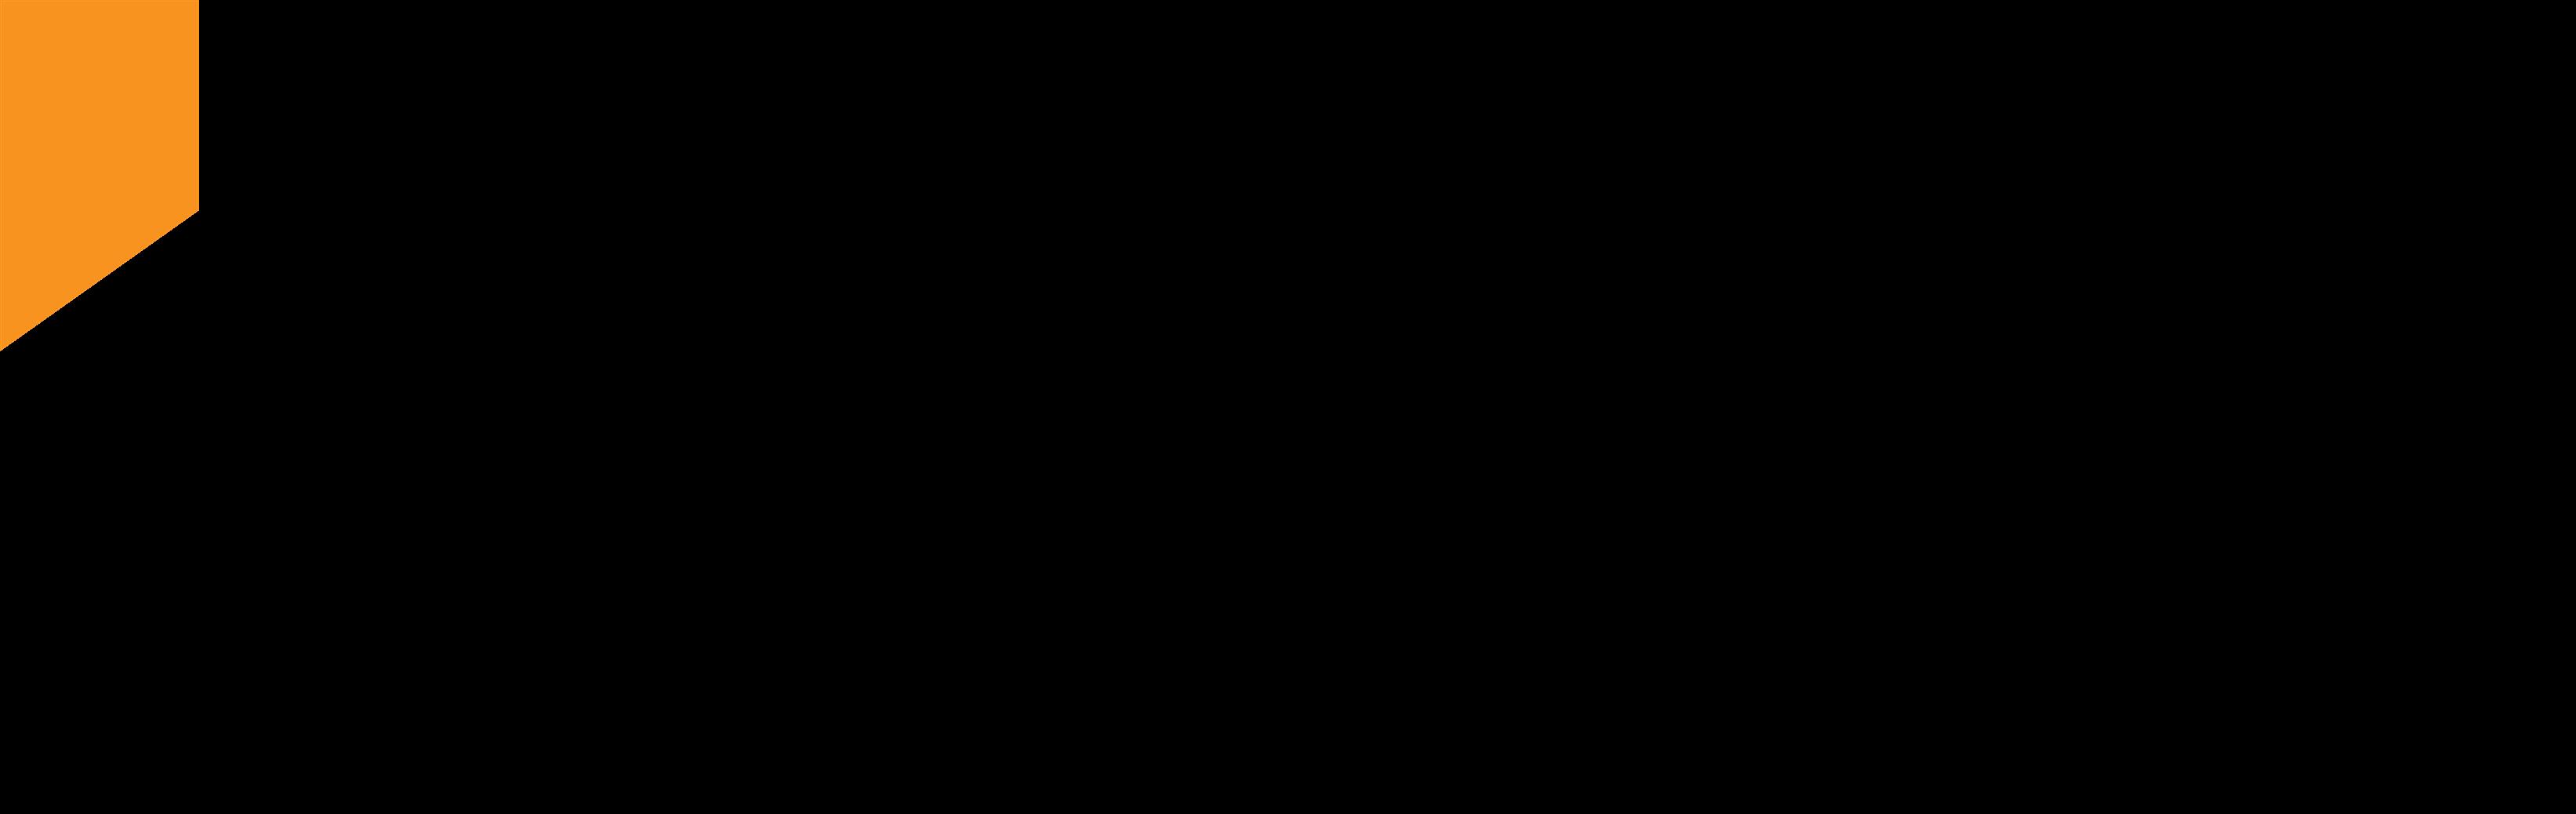 Letacon GmbH